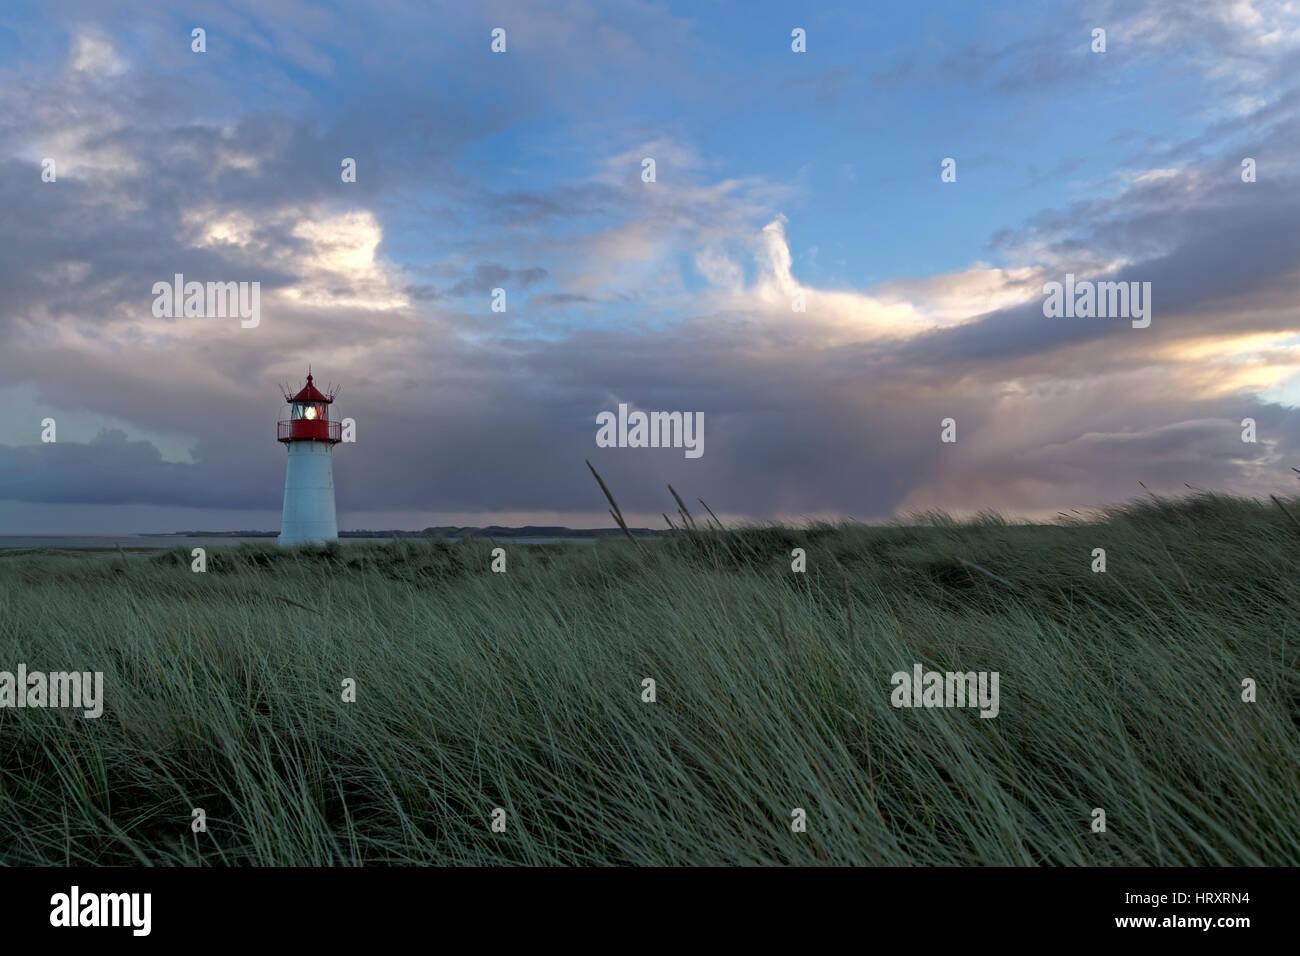 Lighthouse List West, Elbow, Sylt, North Frisia, Germany, Europe - Stock Image